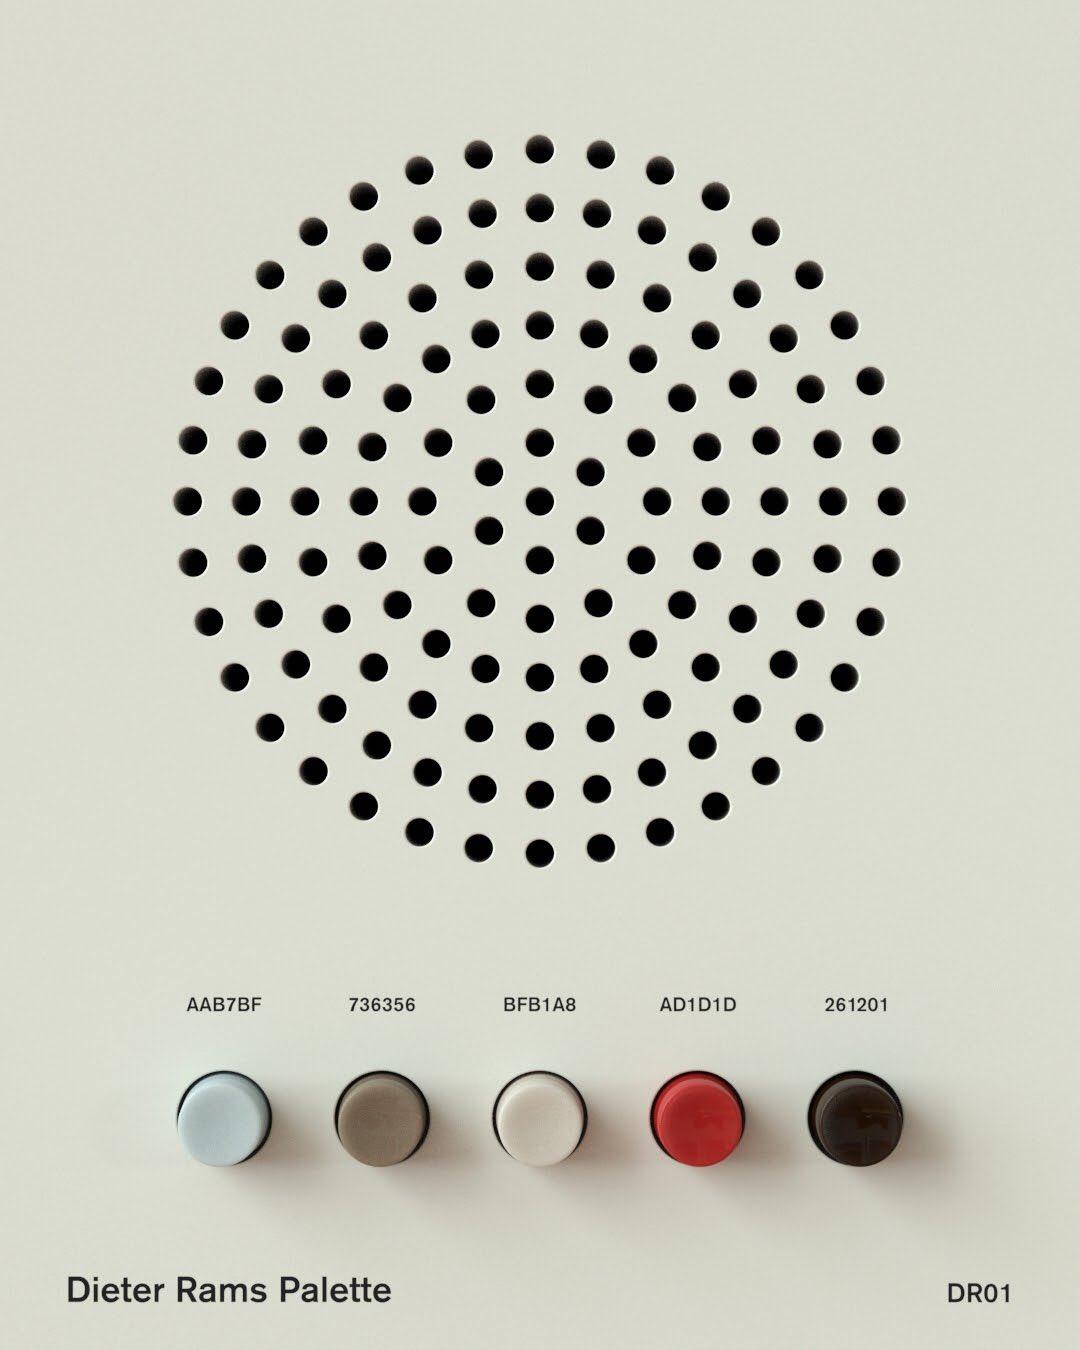 Dieter Rams palettes